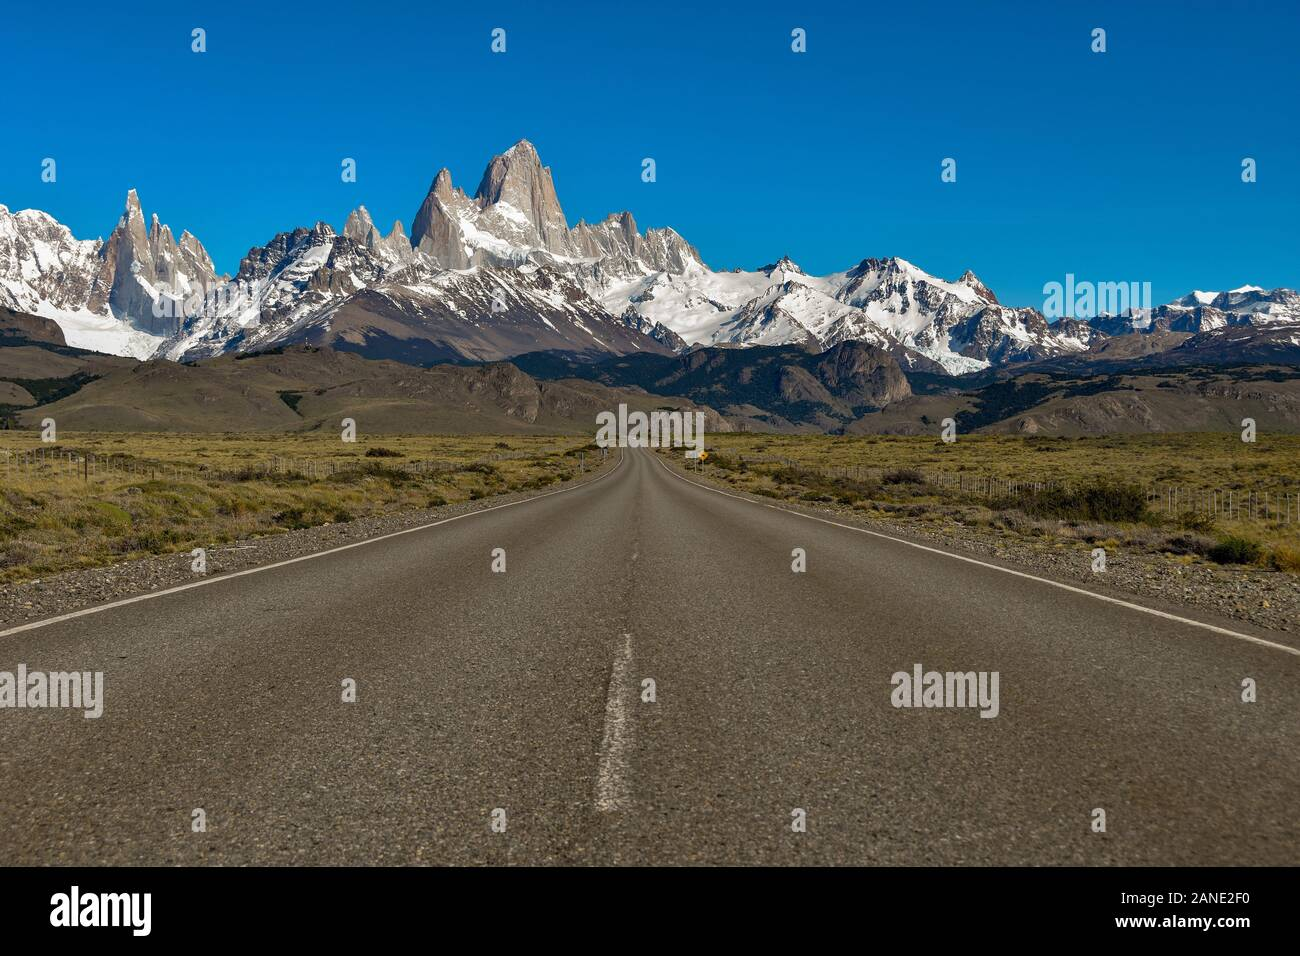 Strada verso El Chalten con famose montagne Fitz Roy e Cerro Torre, Patagonia, Argentina Foto Stock